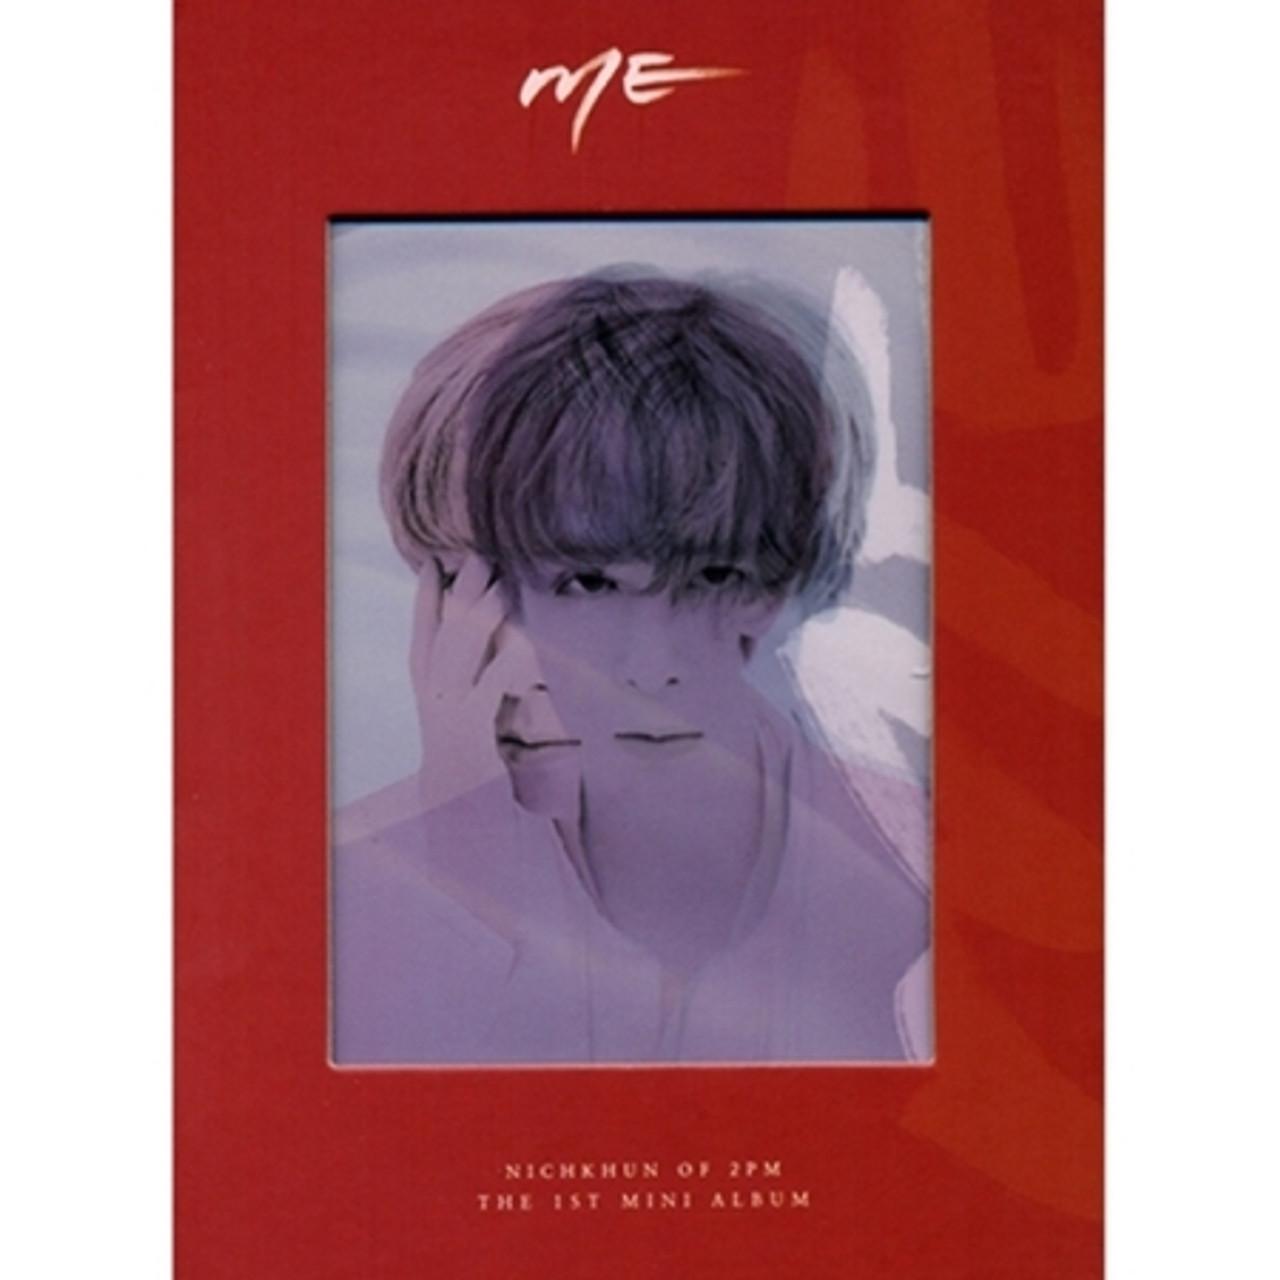 Nich Khun - 1st Mini [ME] + Poster